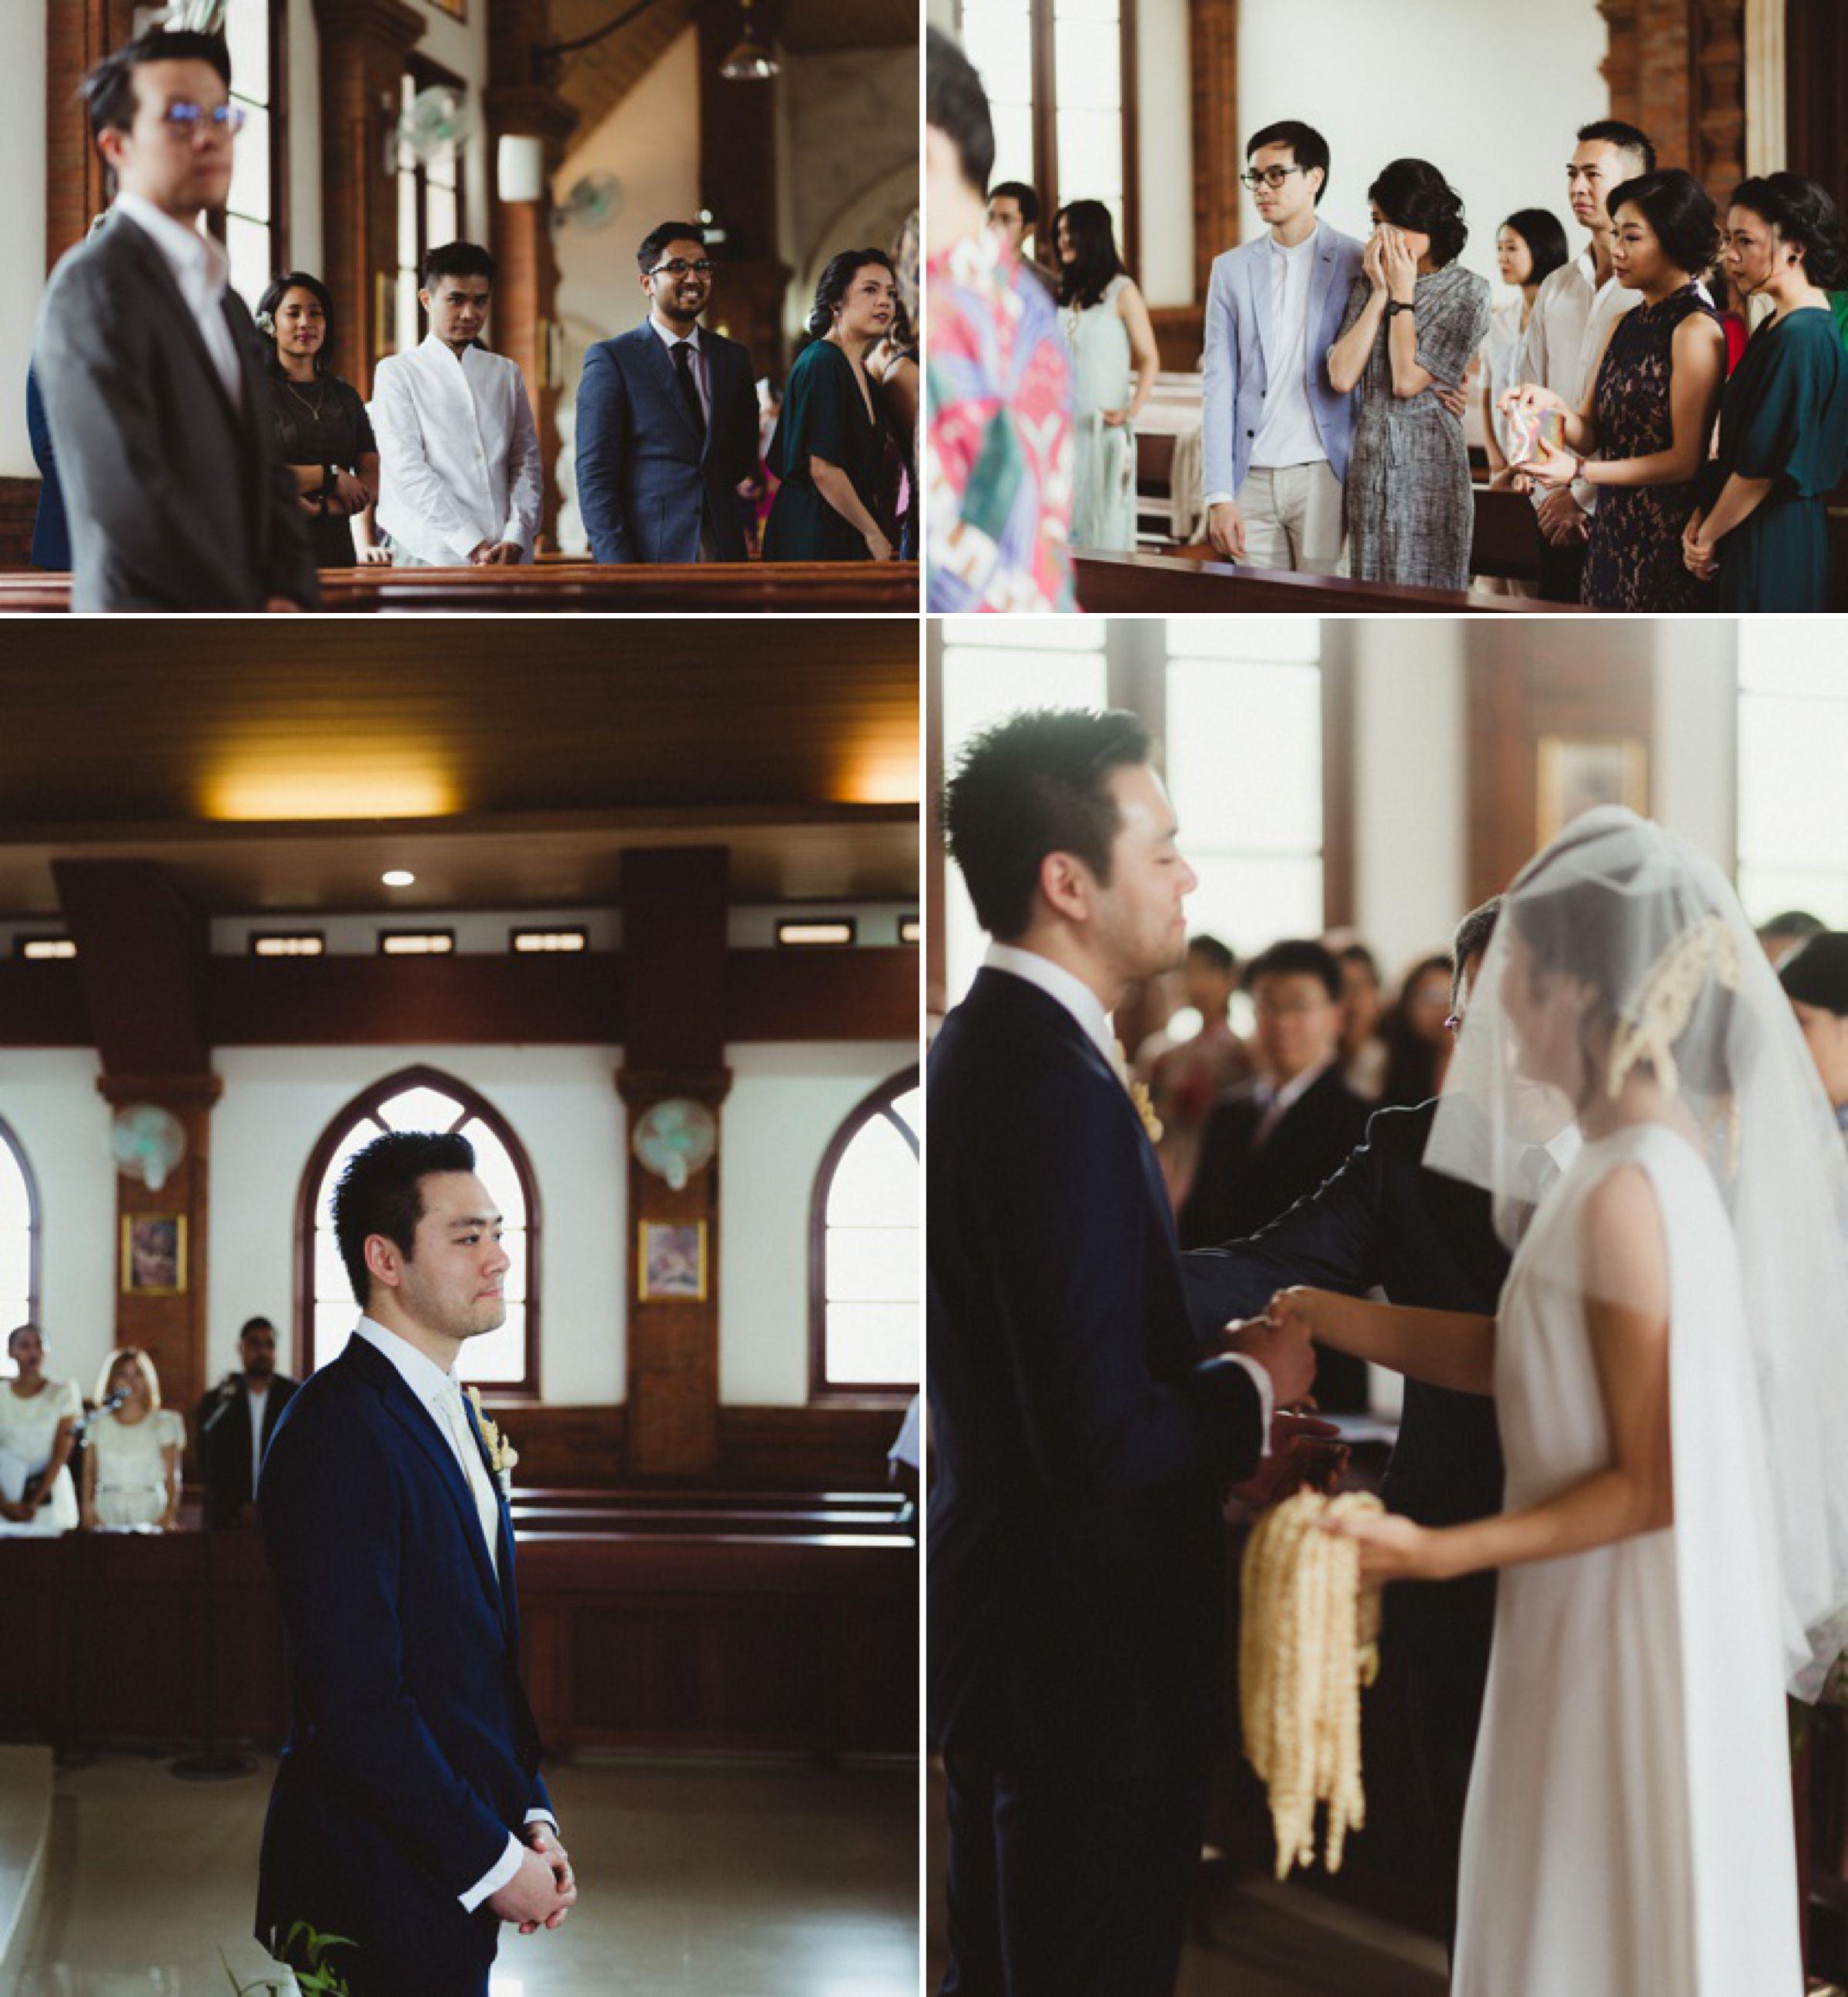 Tim-Danika-Bali-Wedding-Pyara-Photo-Evans 26.jpg